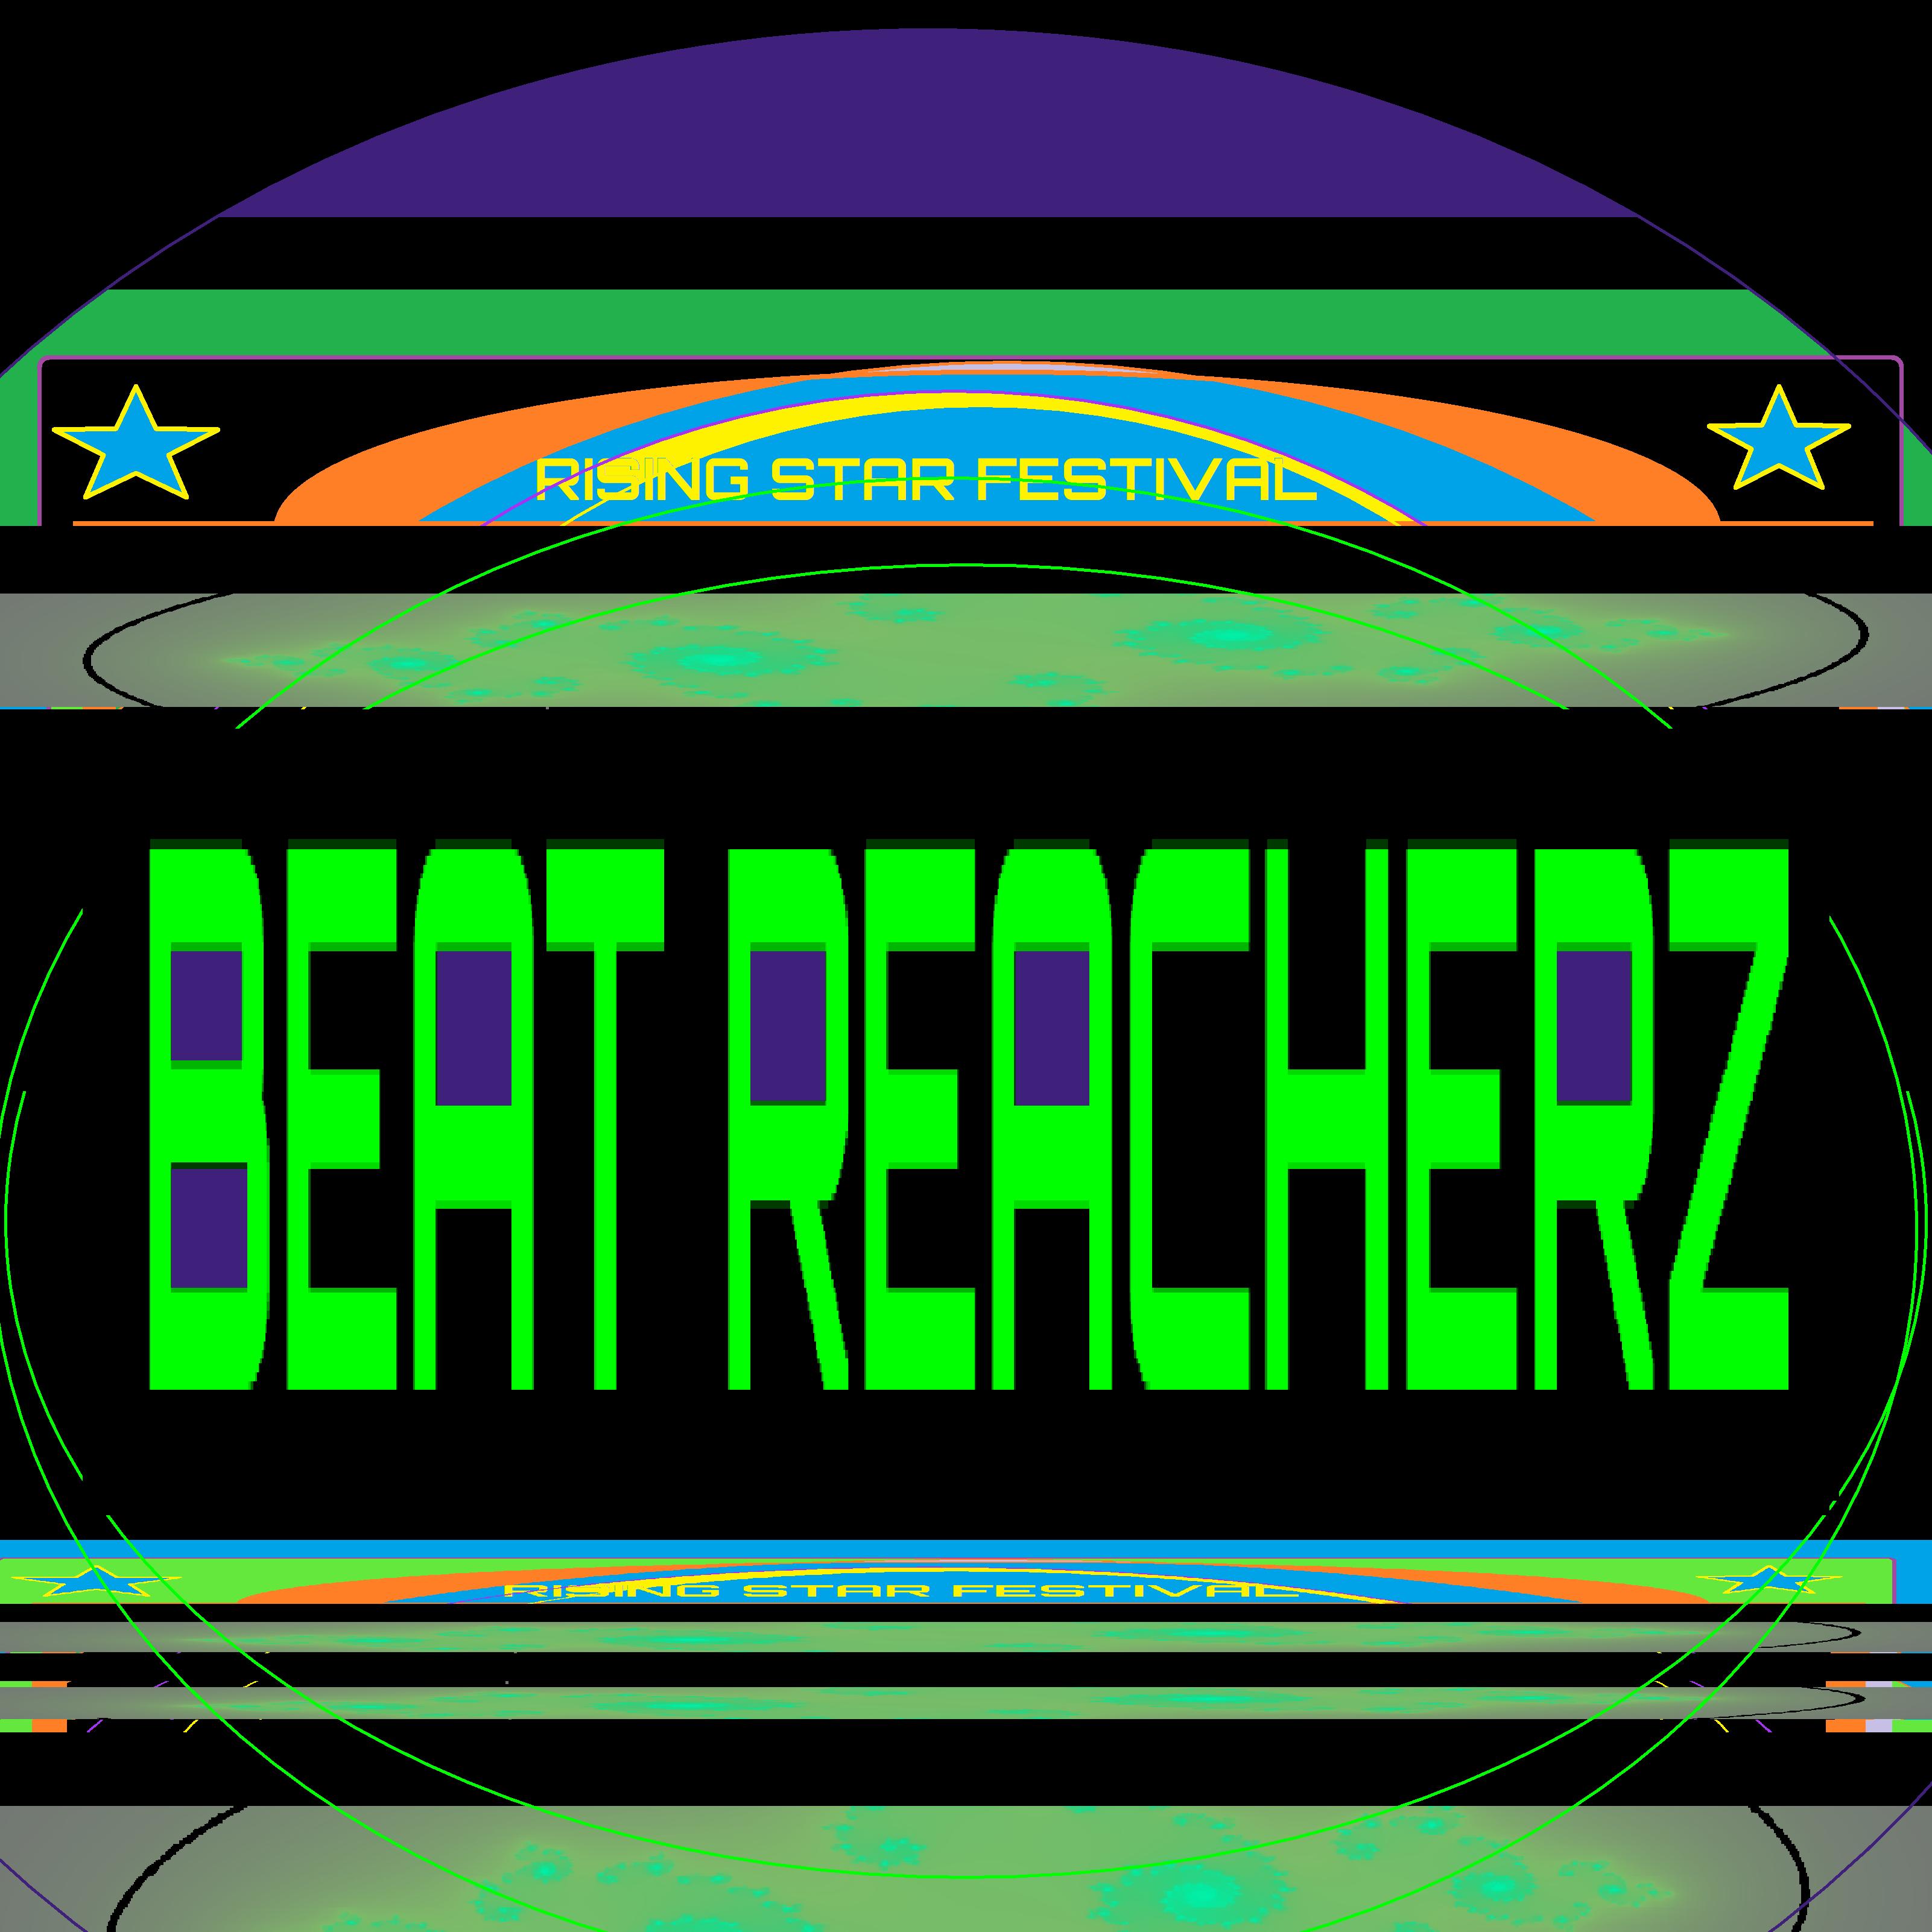 BEAT REACHERZ